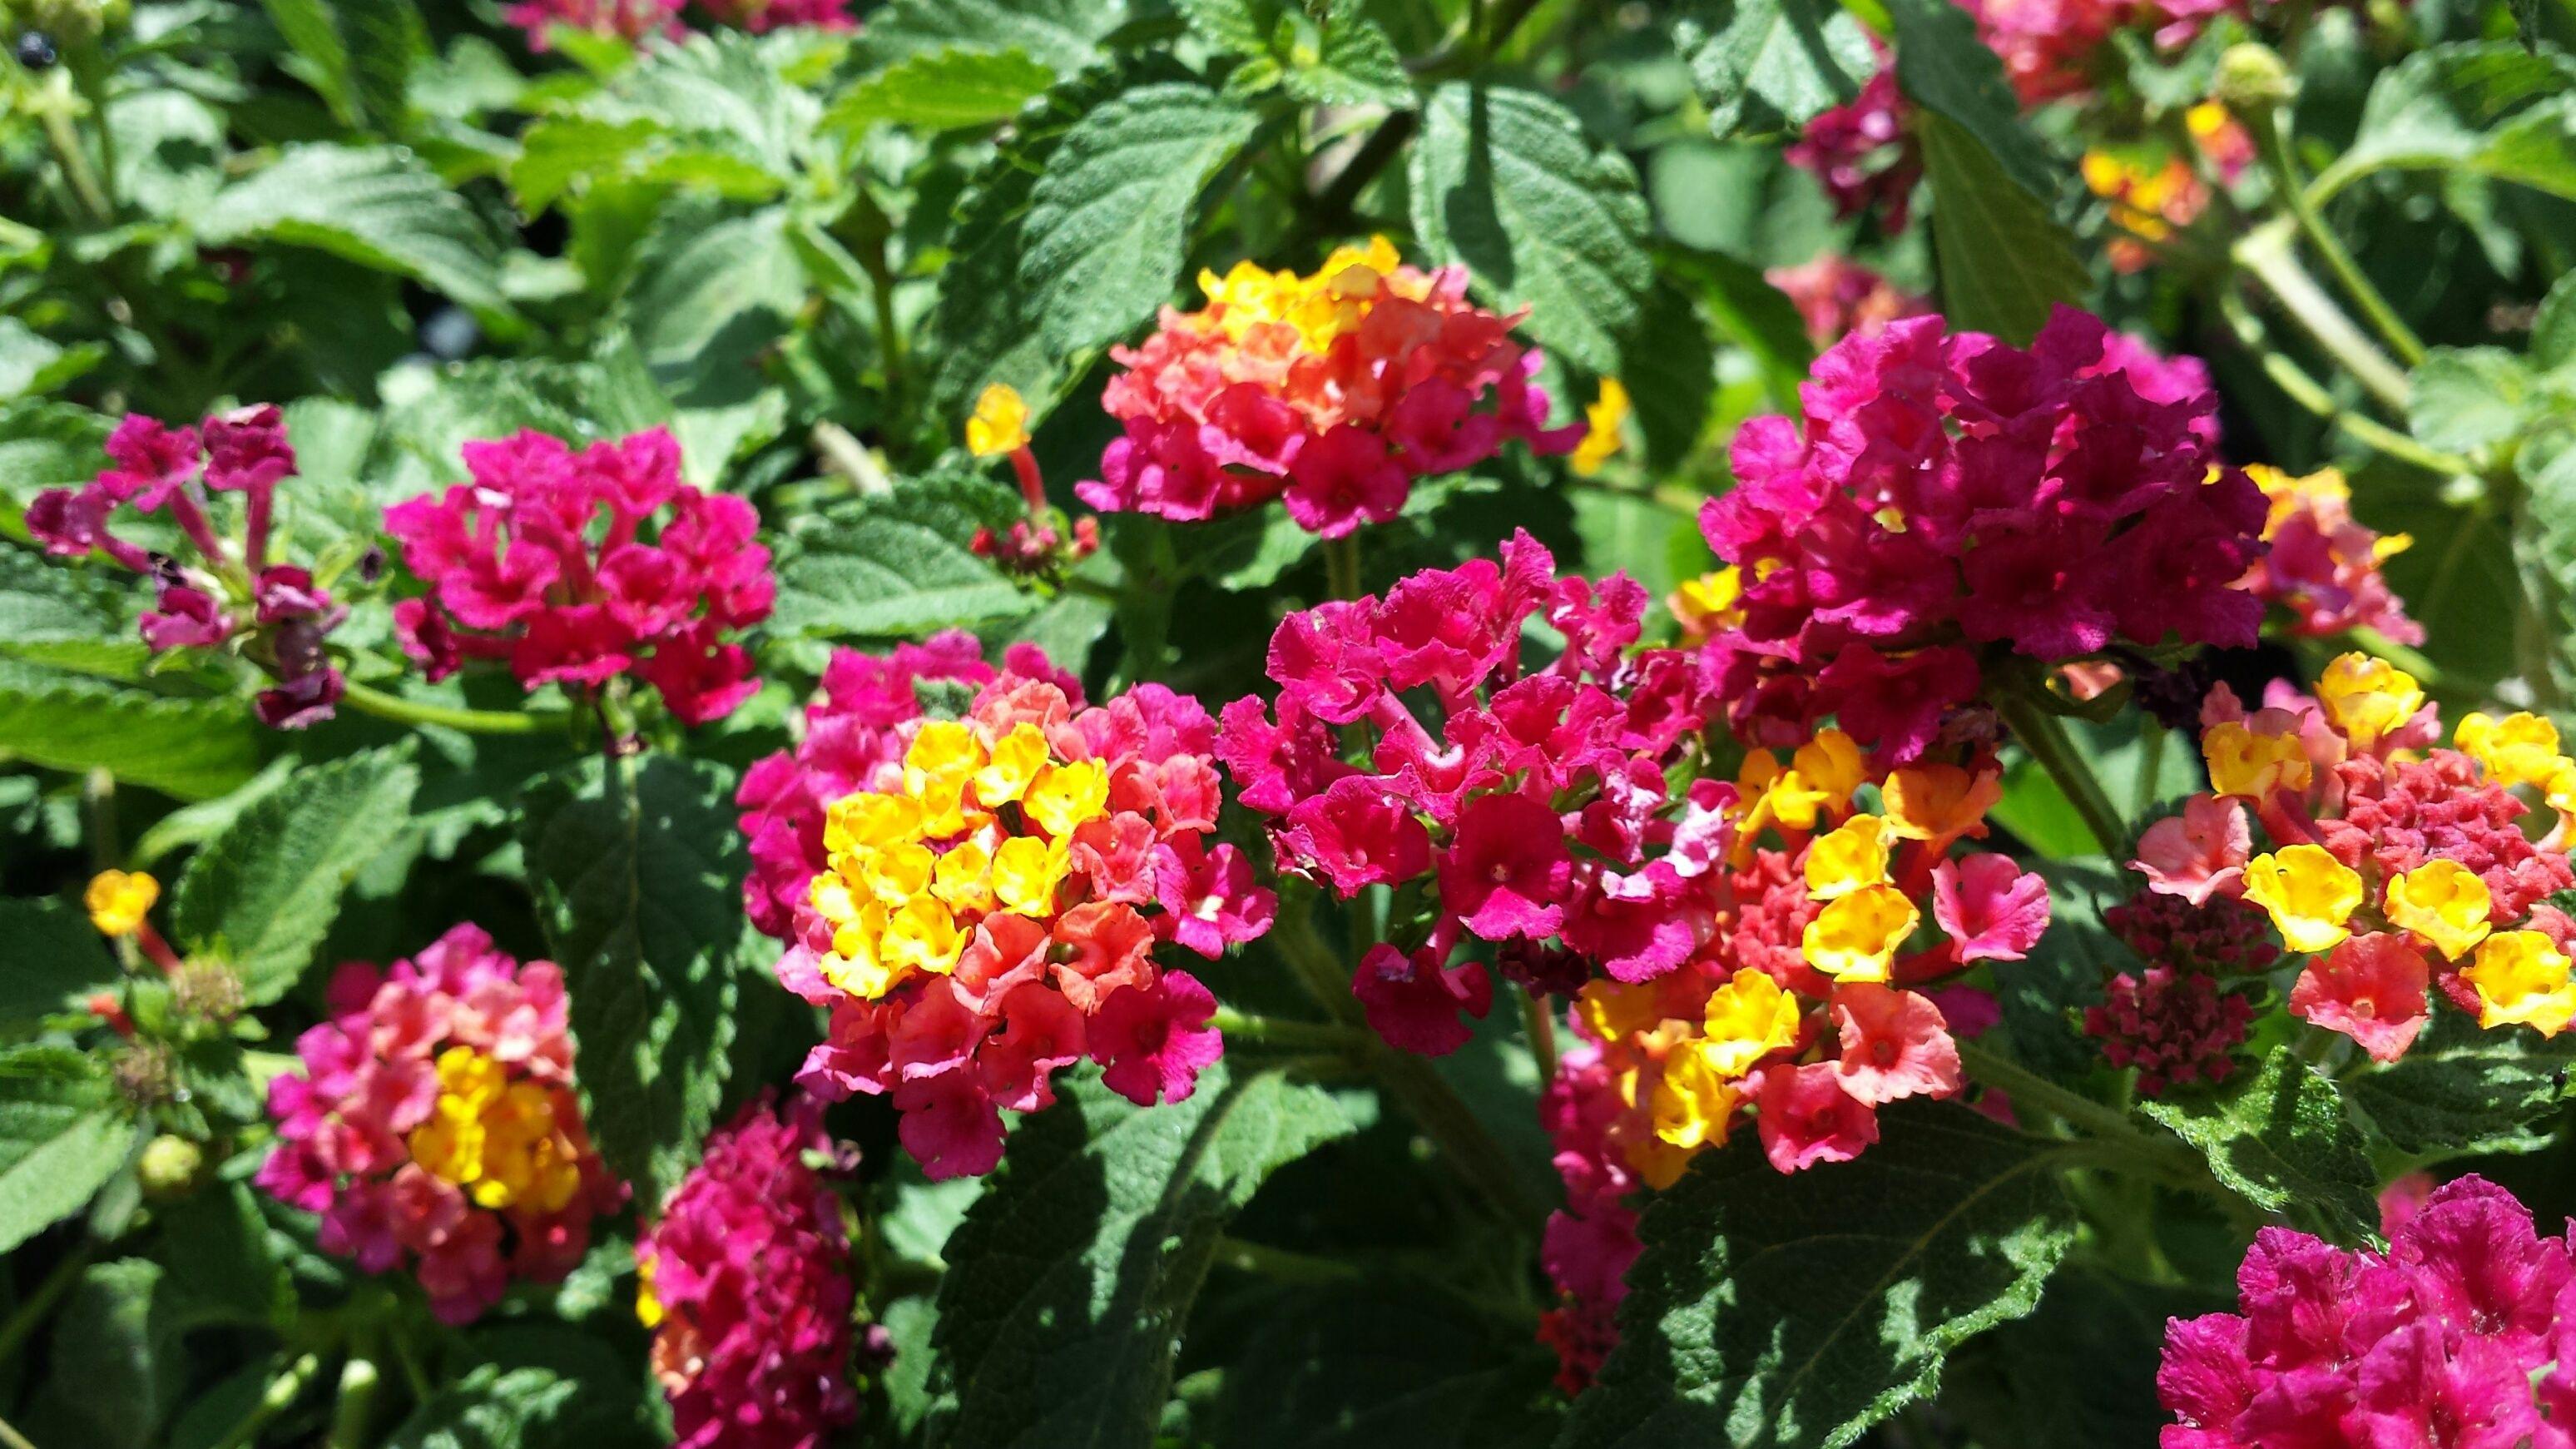 Irene Lantana Lantana Camarena Irene Attractive Mounding Variety To 3 5 Feet Or More Has Magenta And Yellow Flower Lantana Summer Flowers Flowering Trees